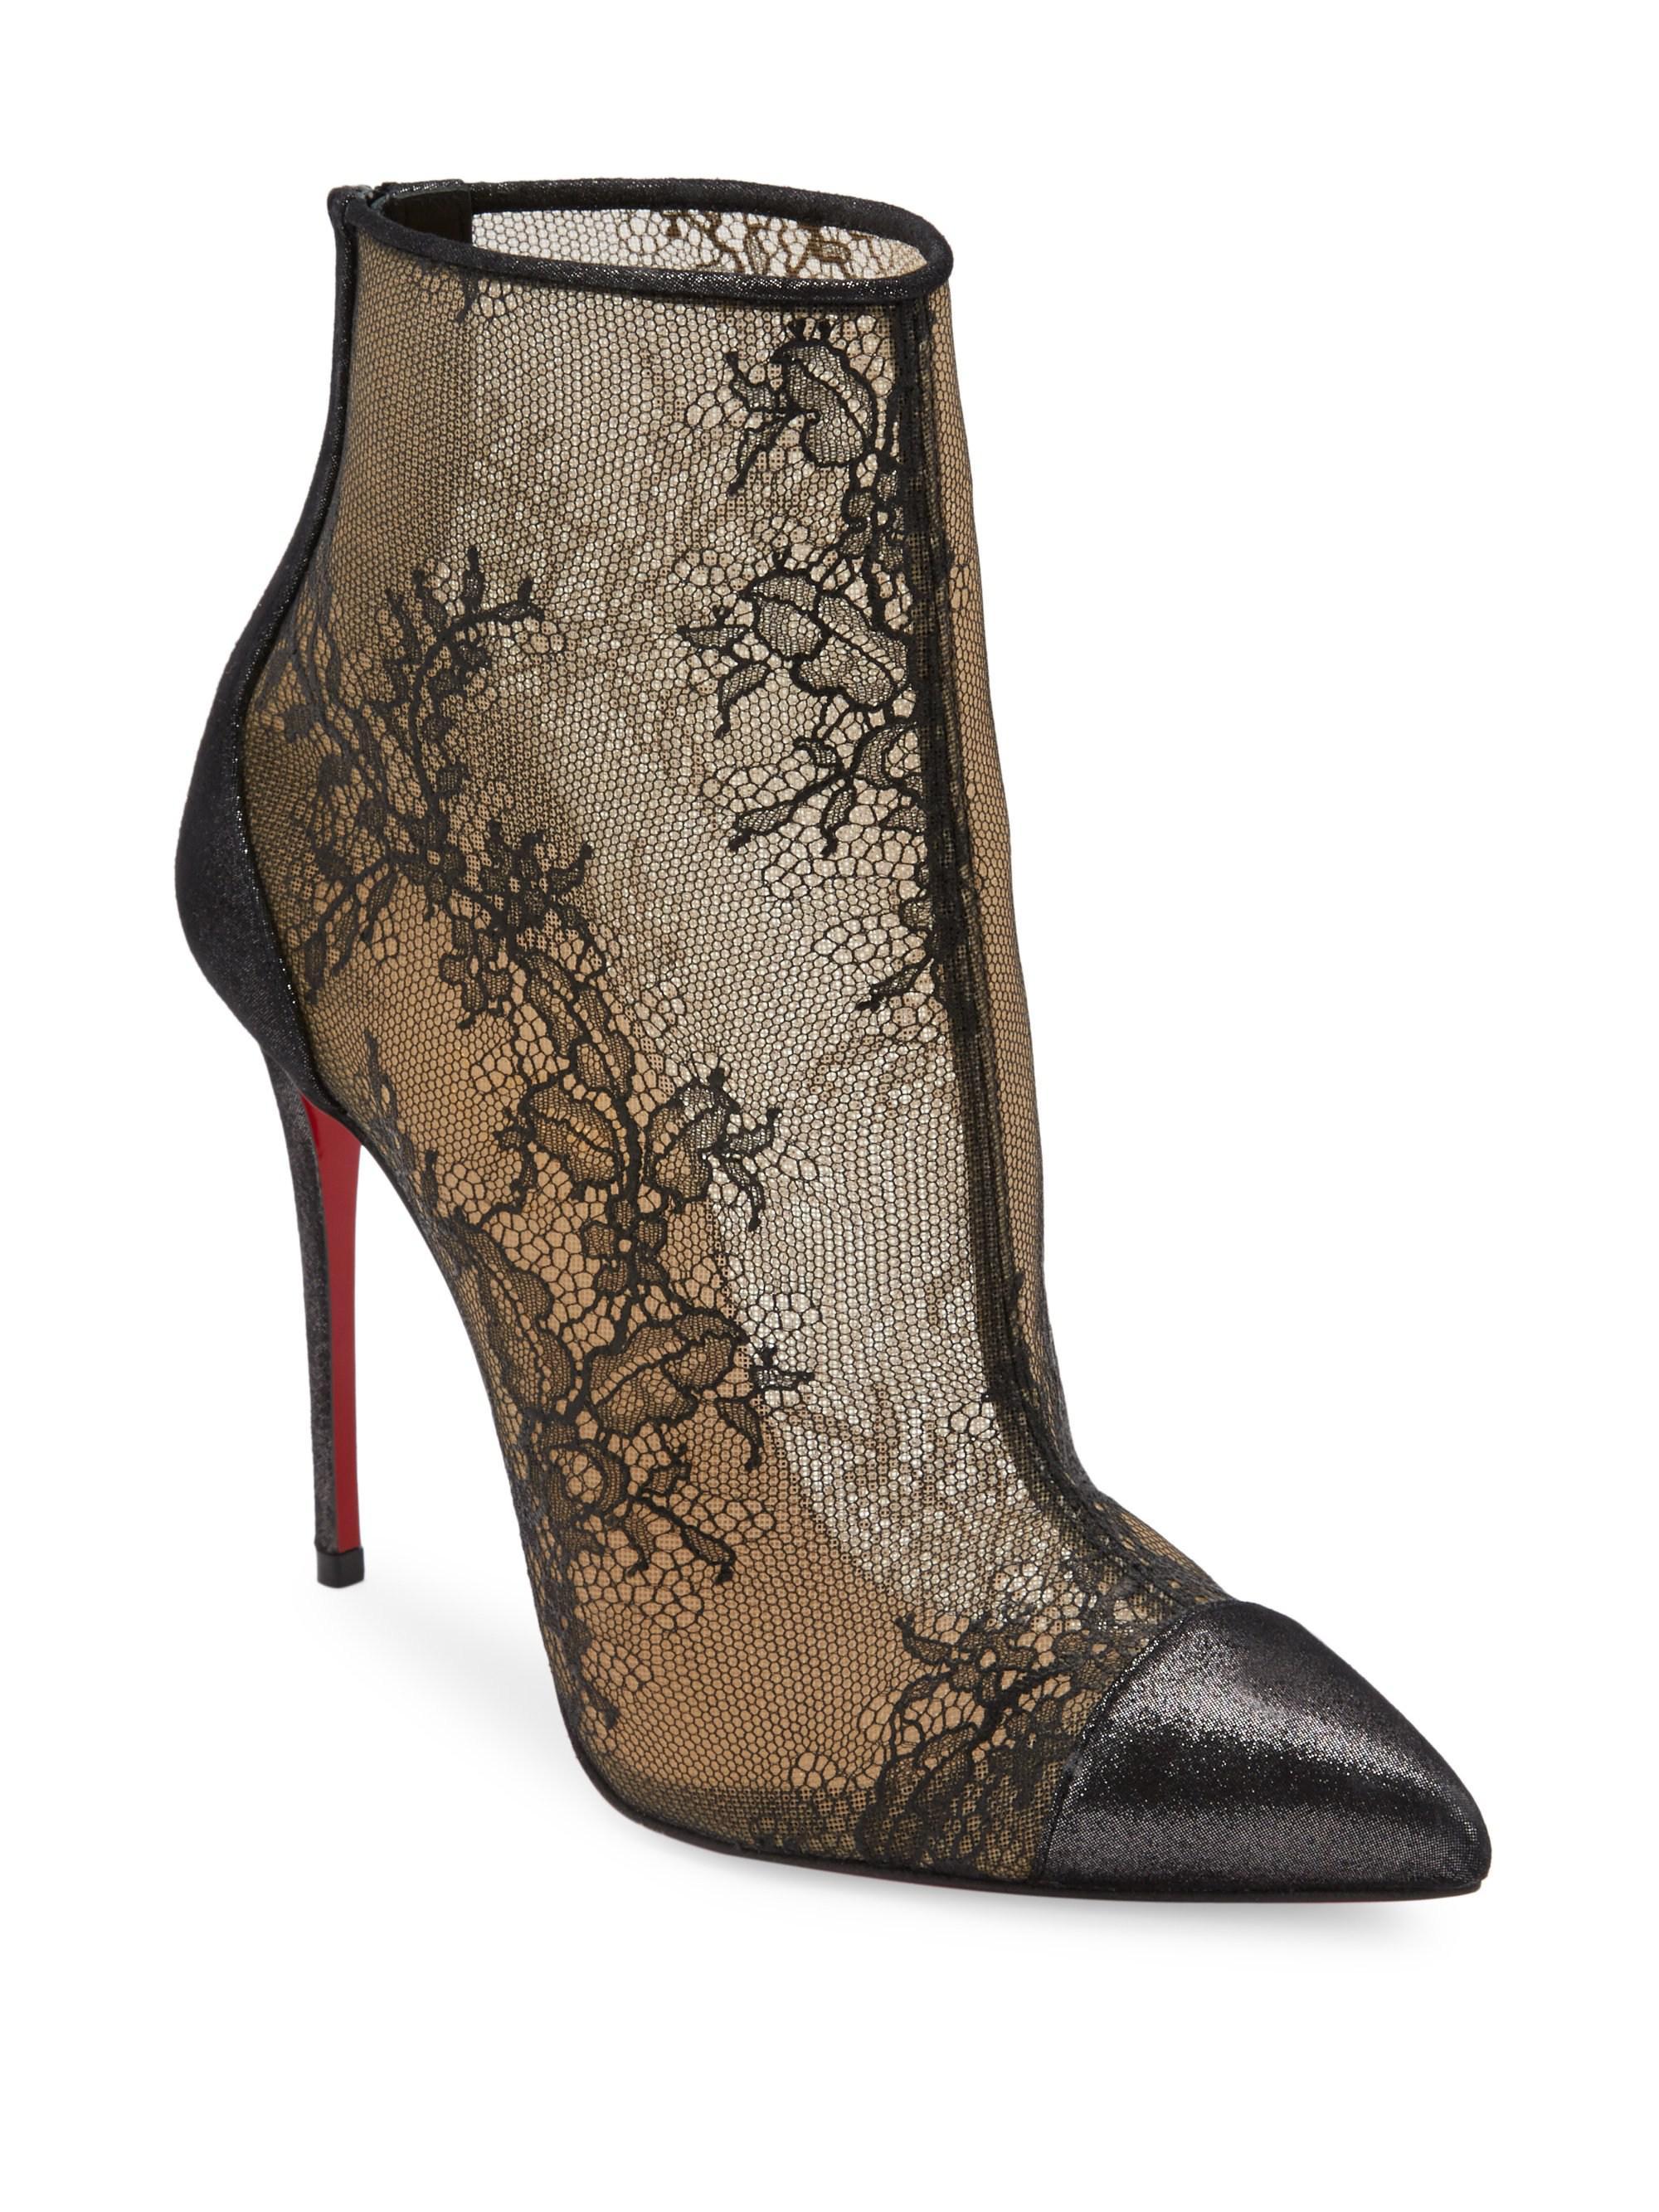 e30ea2a6561 coupon for christian louboutin js shoe boots rubber 9e743 4c11a